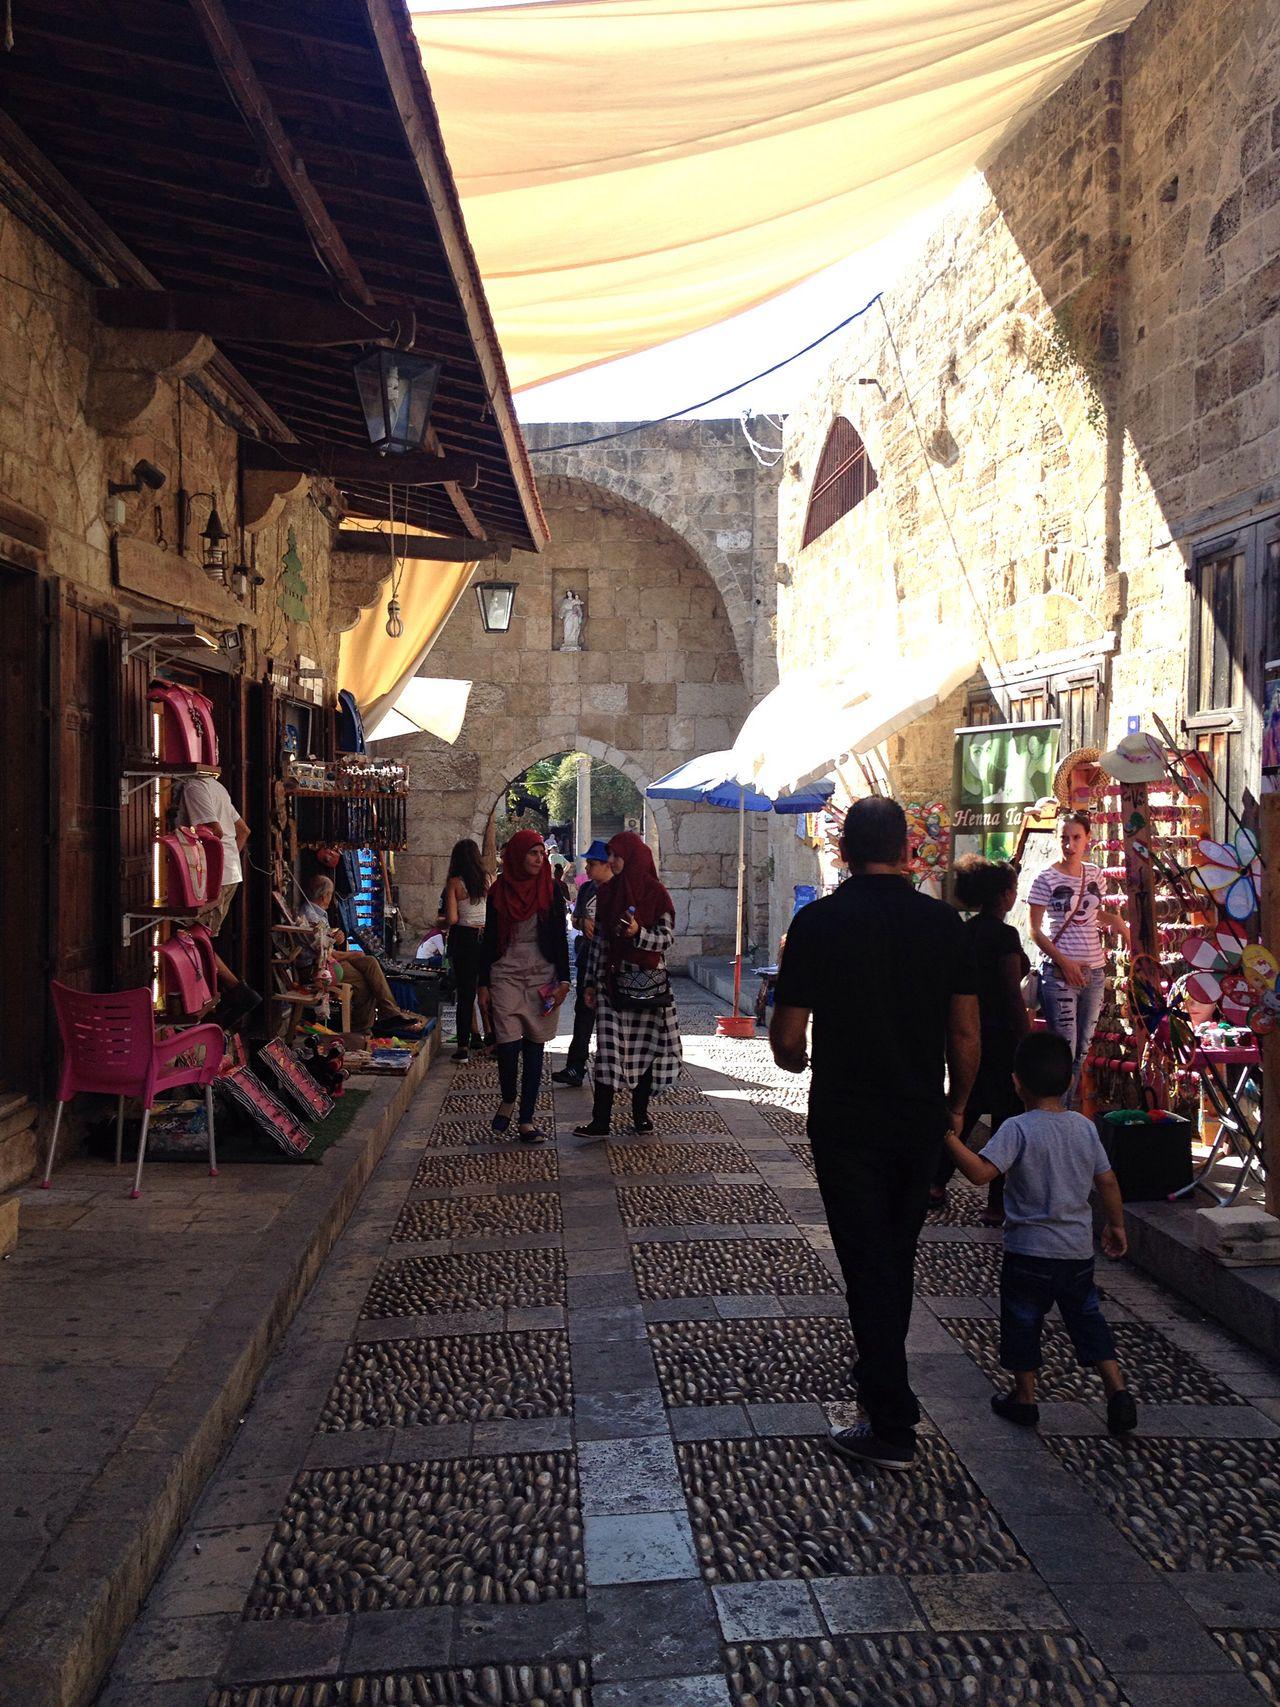 Cobblestone Old Souk Byblos Lebanon East Mediterranean